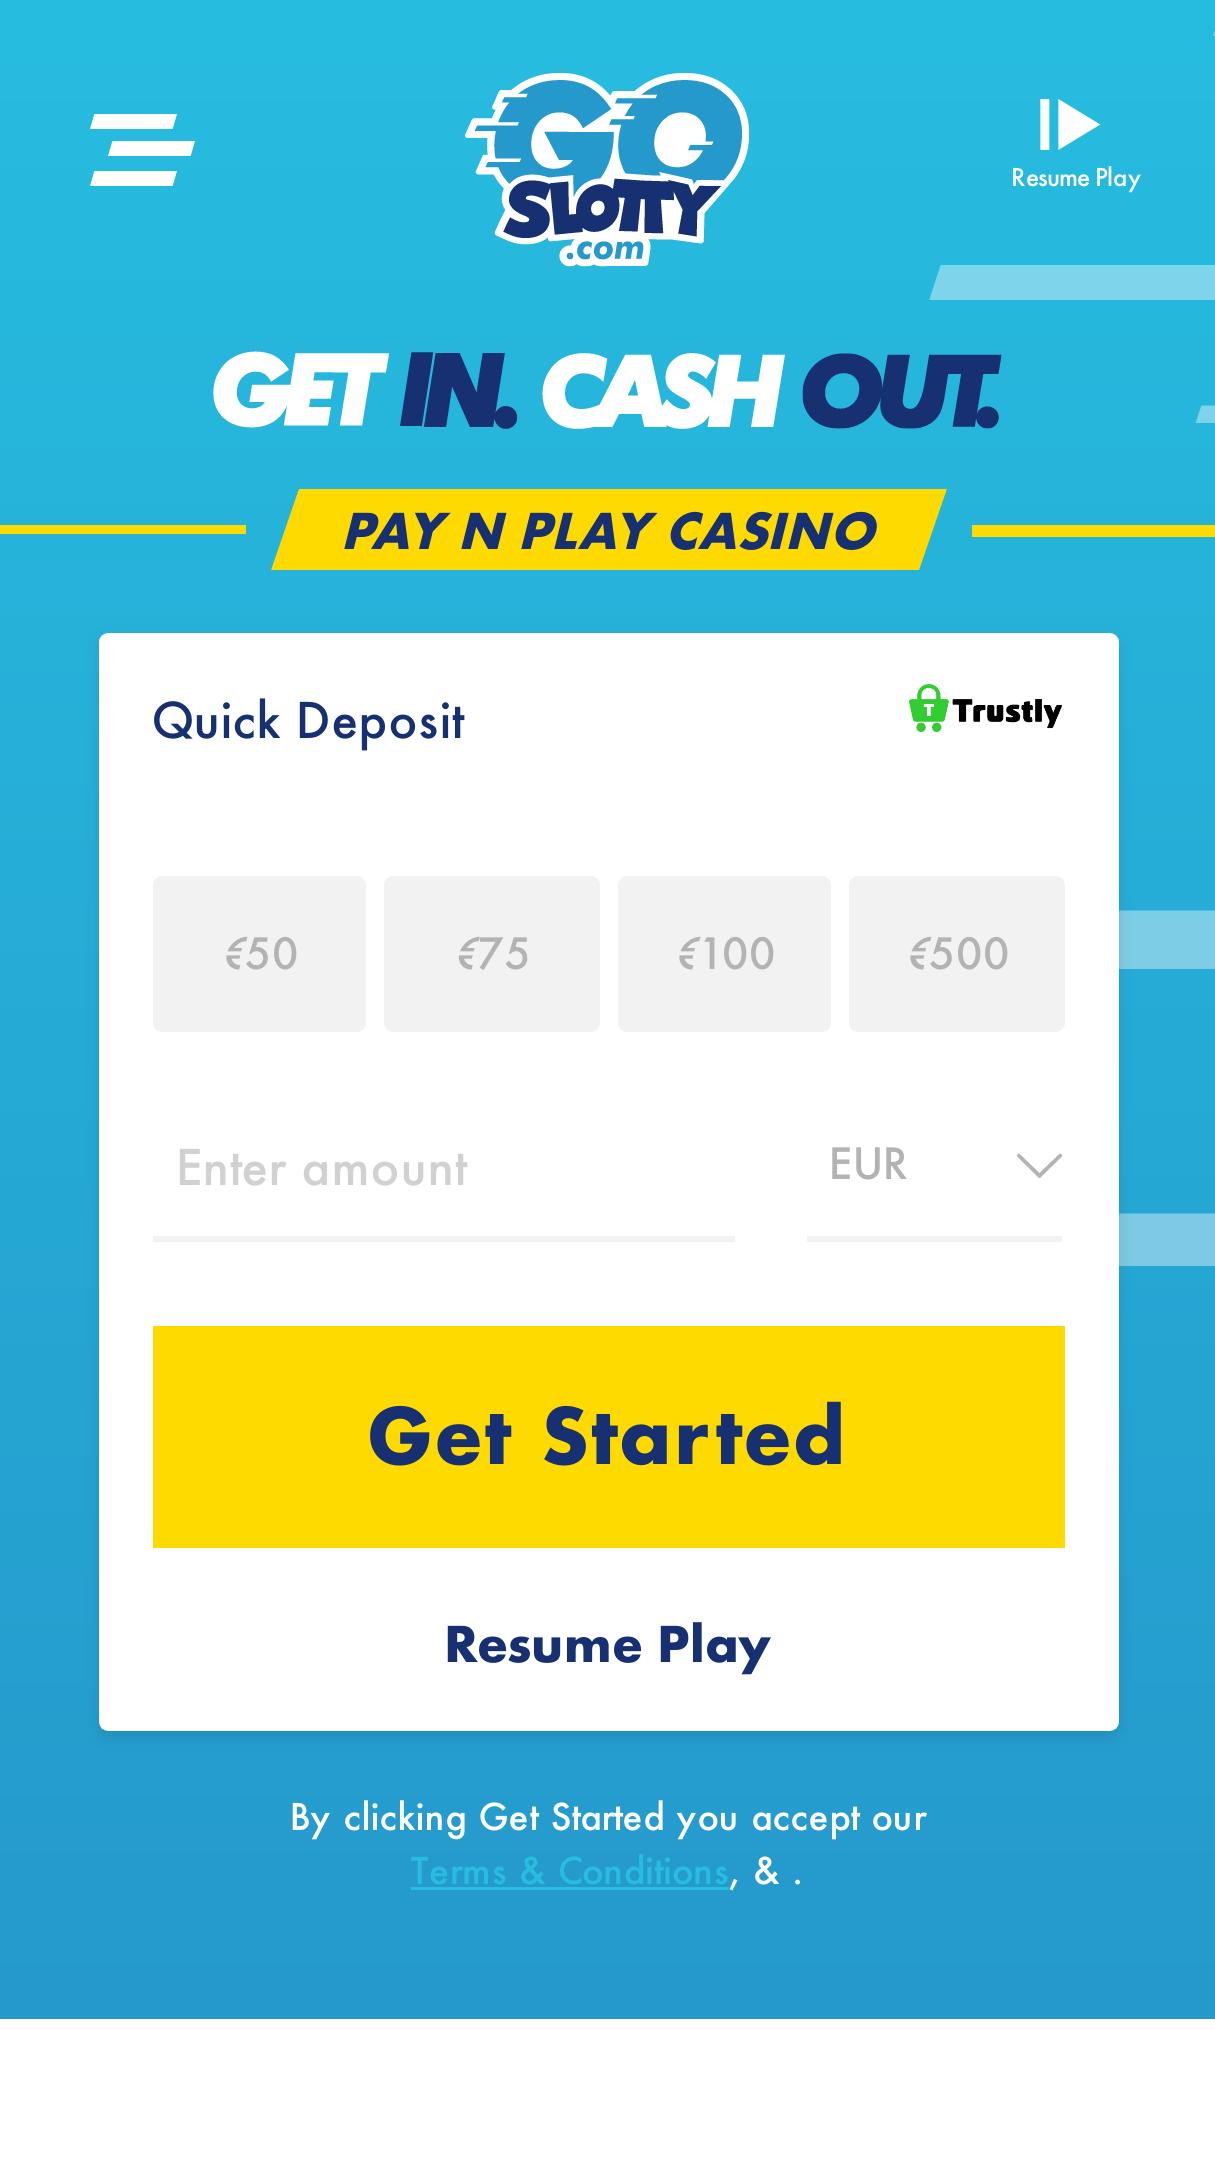 Casino heist gta online guide